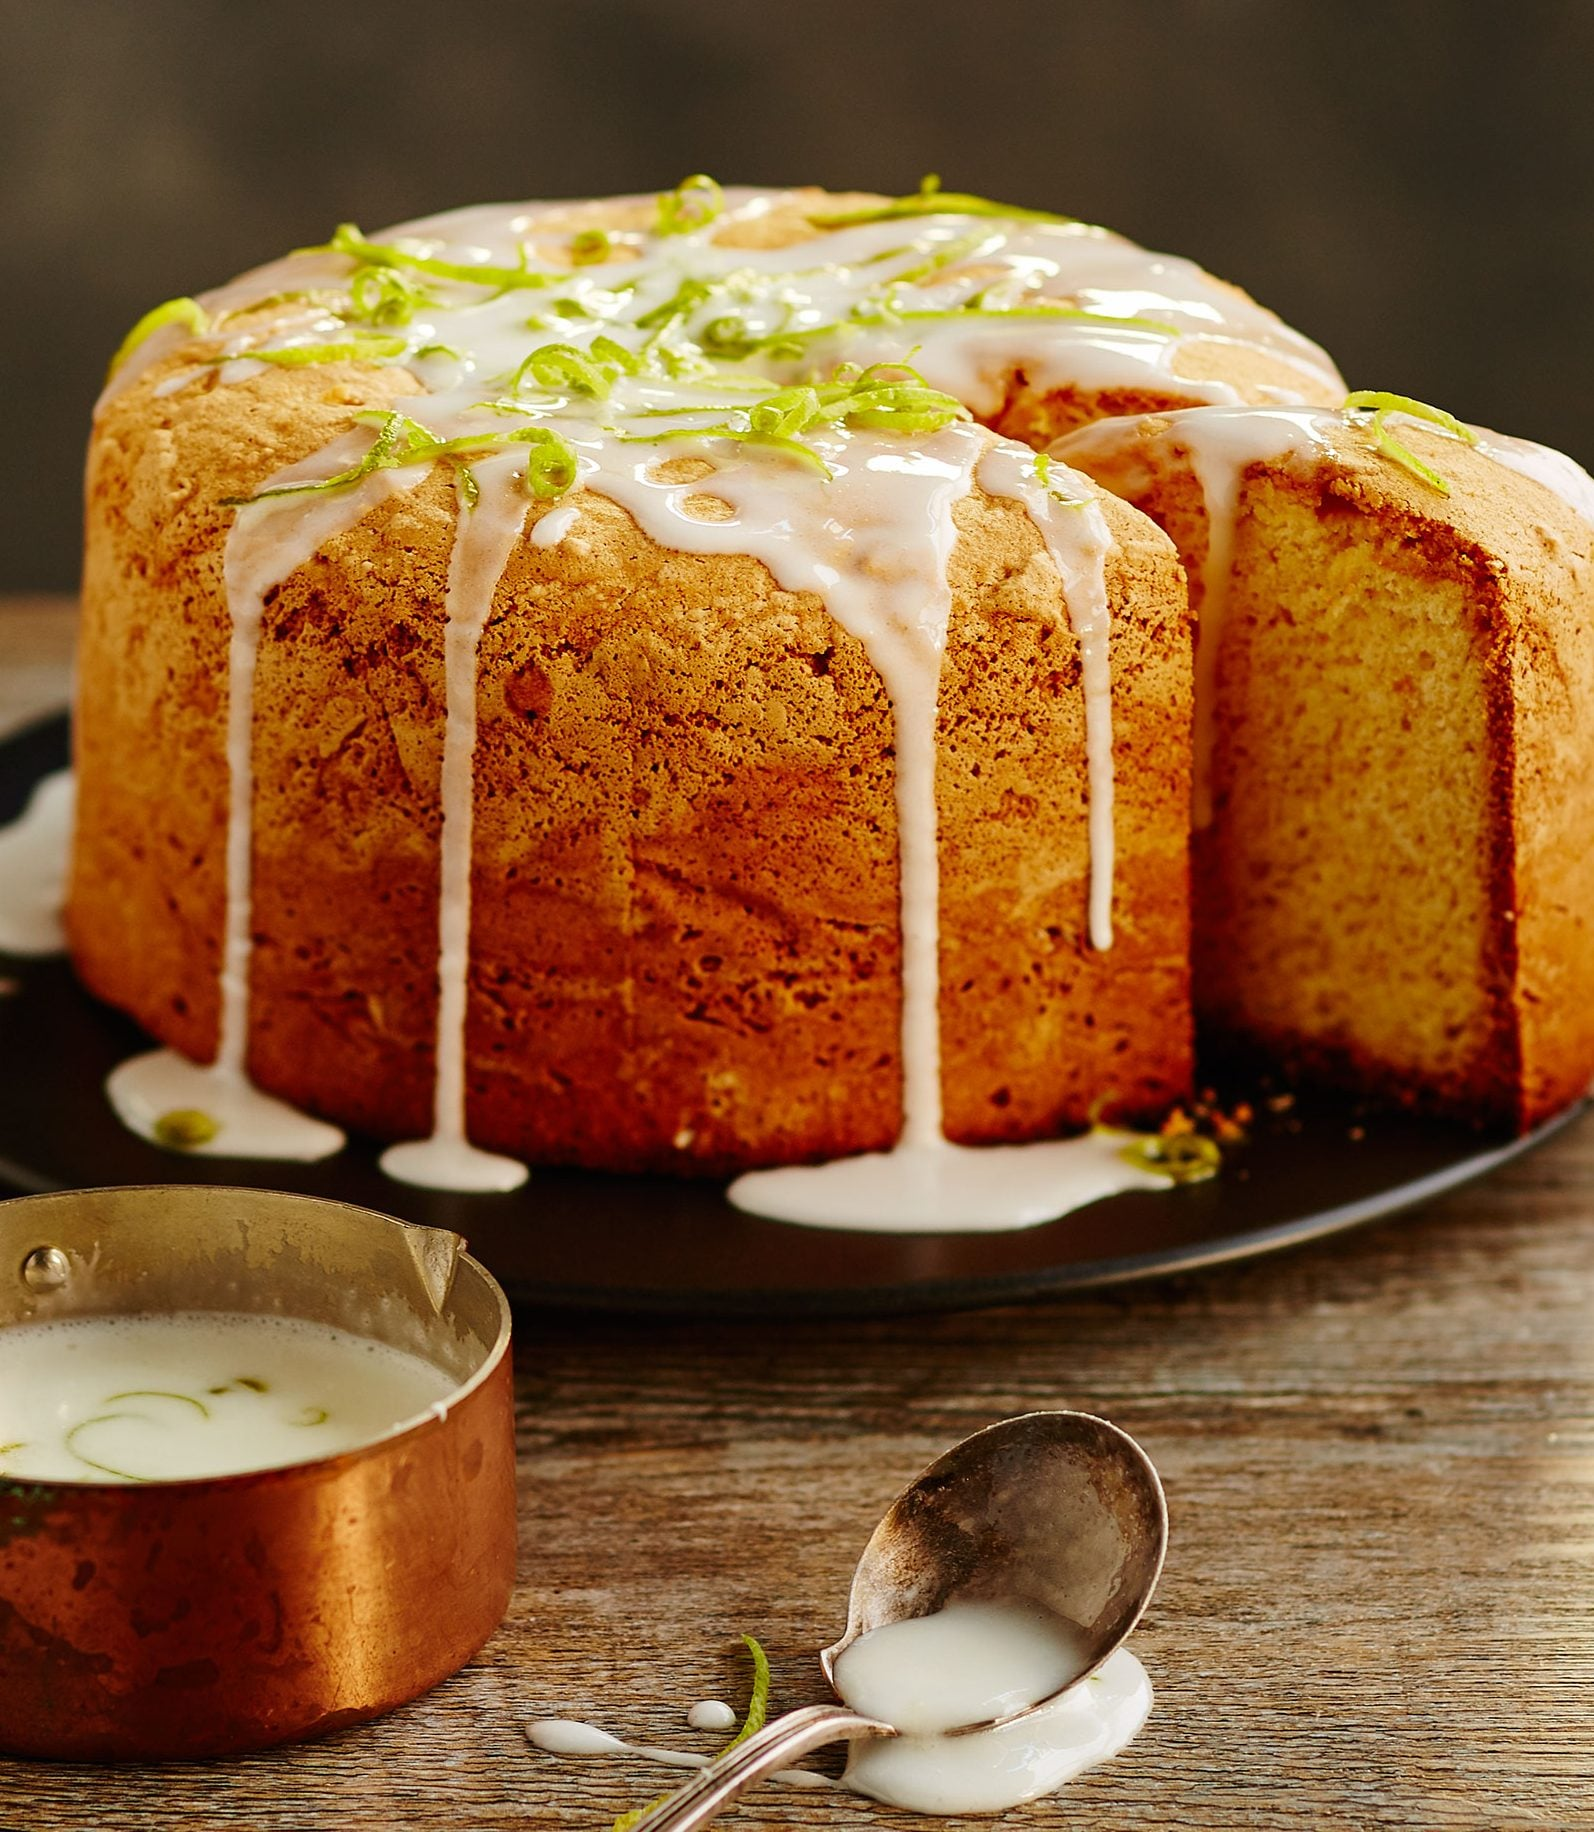 Cake, food styling